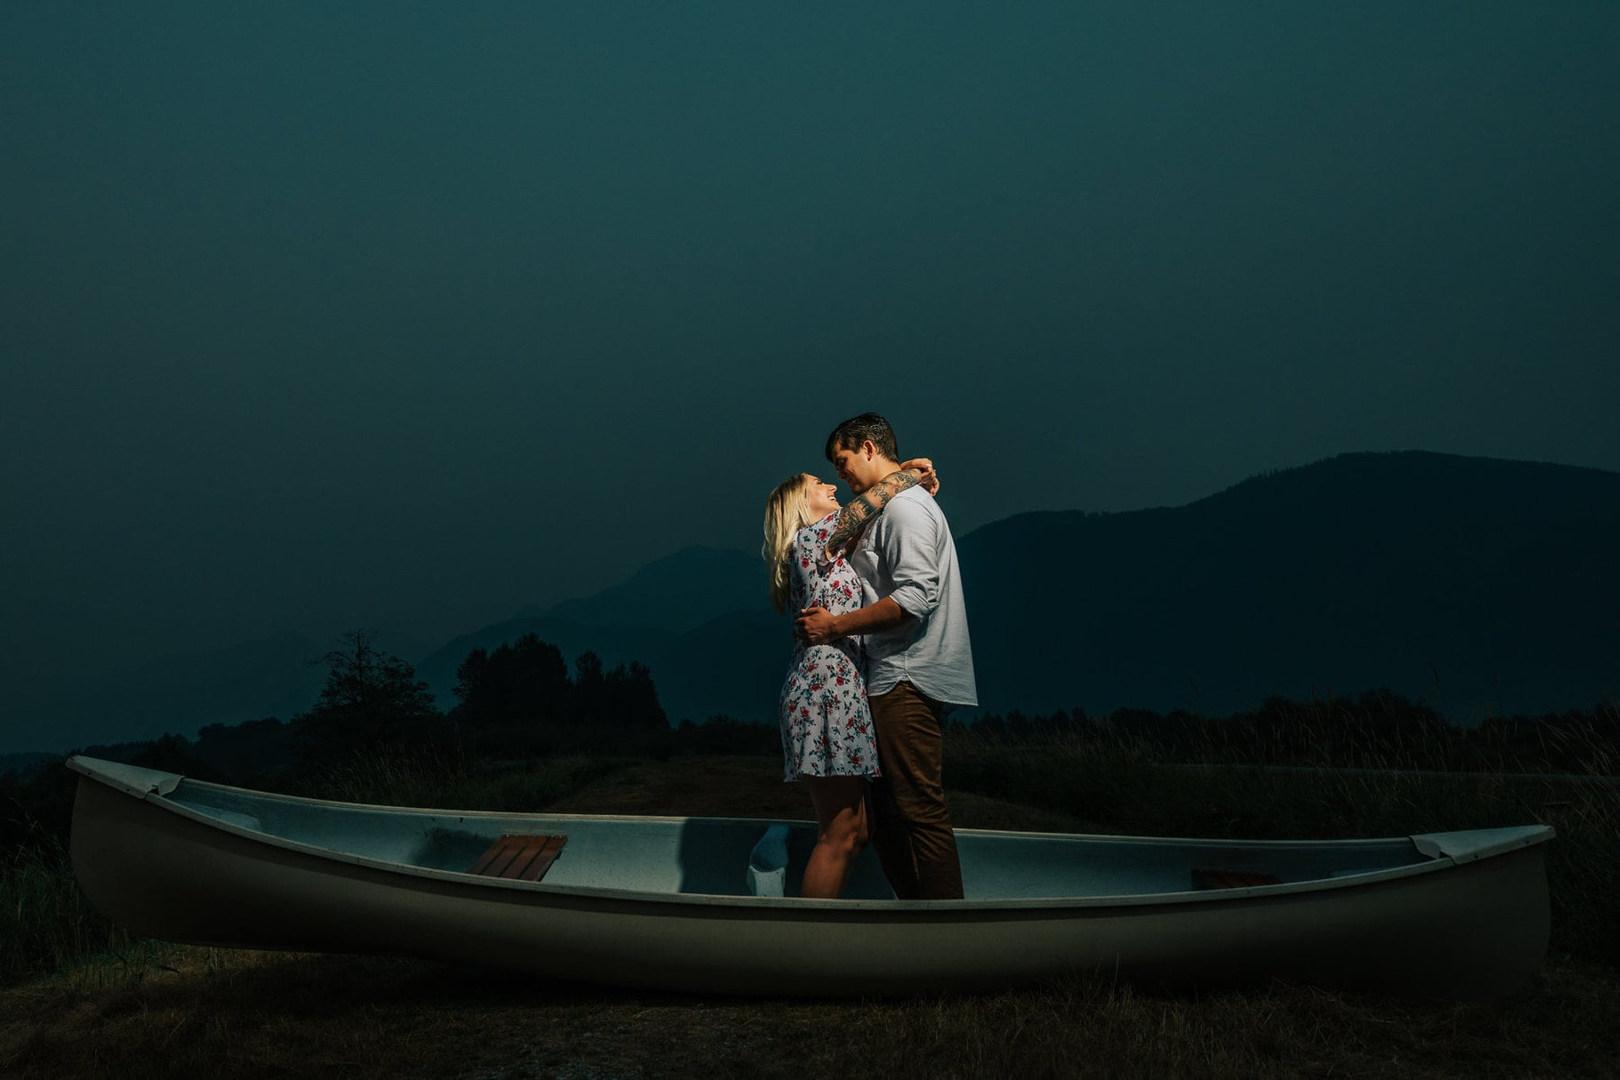 Vancouver-engaged-couple-kissing-boat-ni